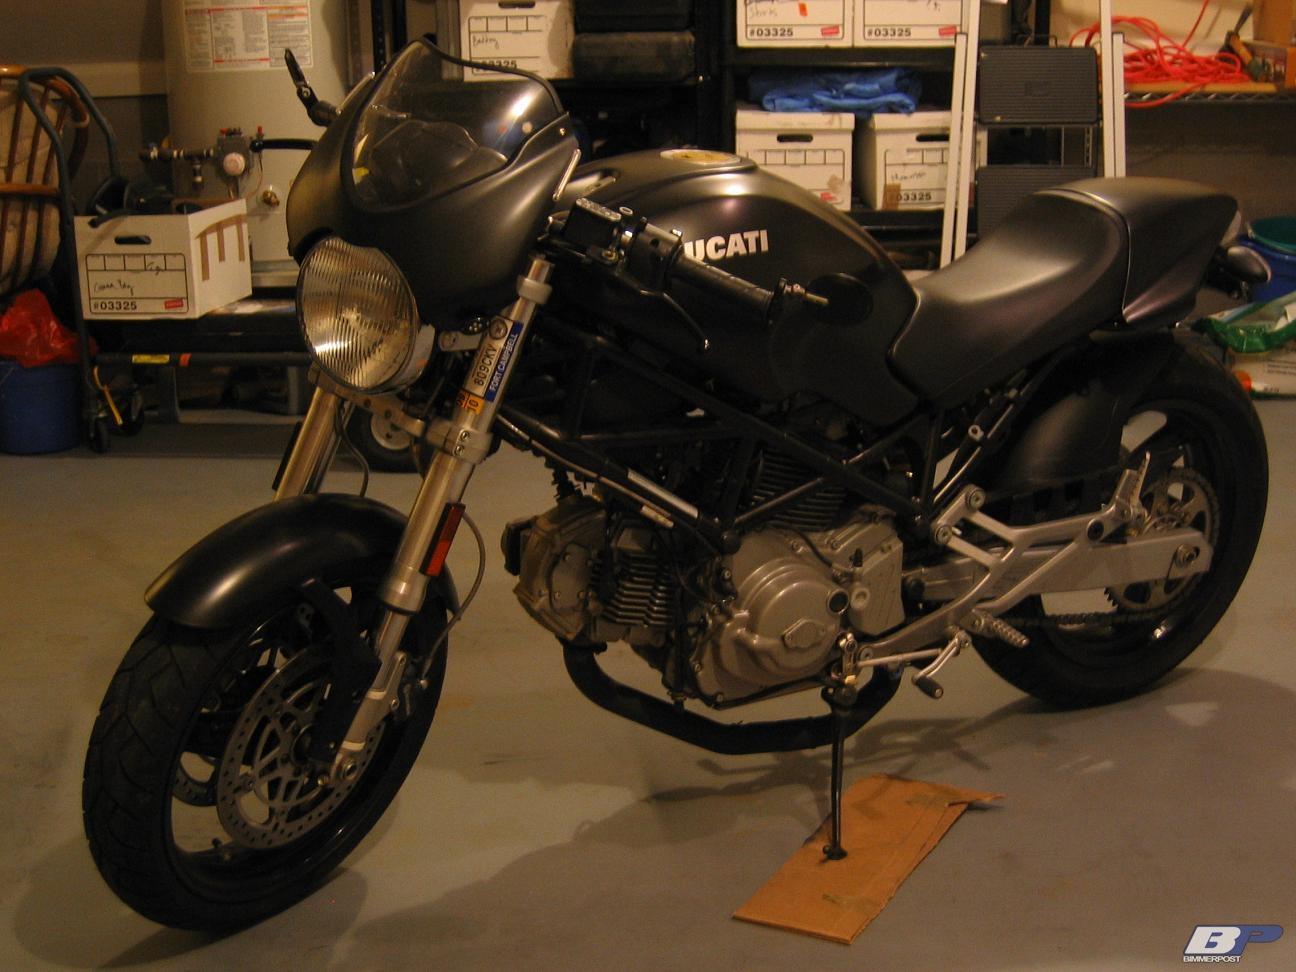 Ht4mds 2005 Ducati Monster Dark 600 Bimmerpost Garage